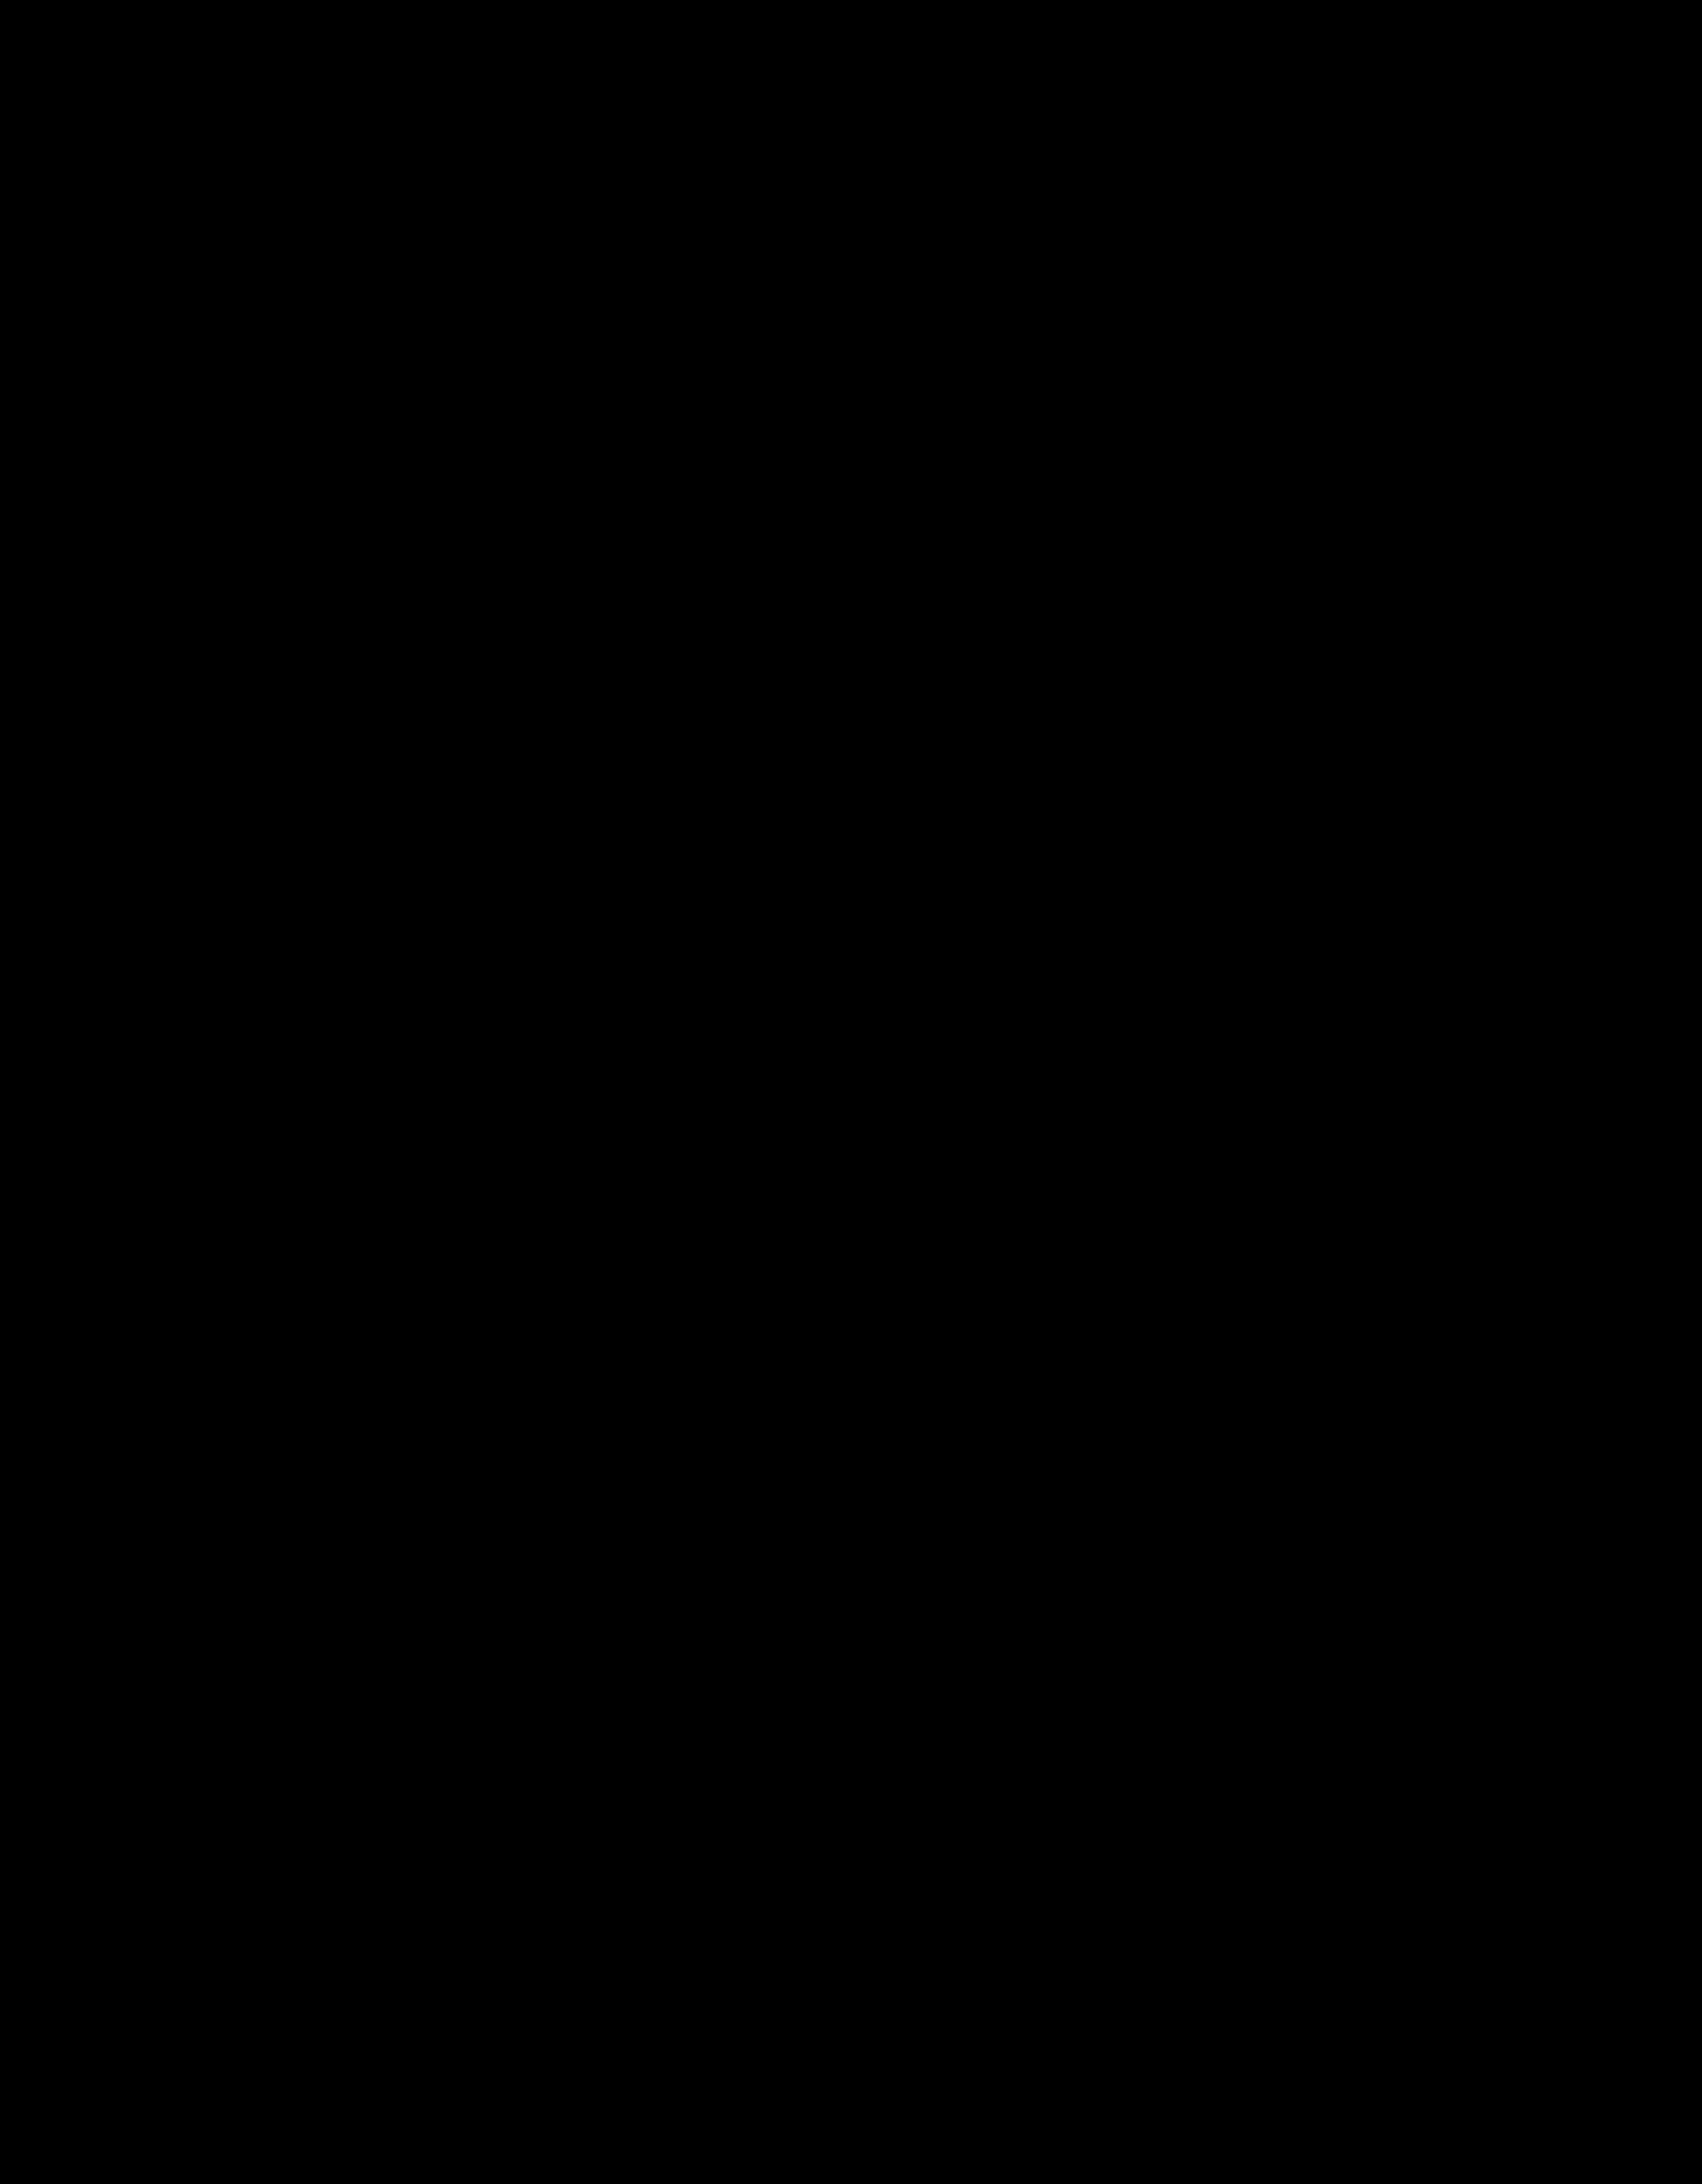 scalene - Clipground